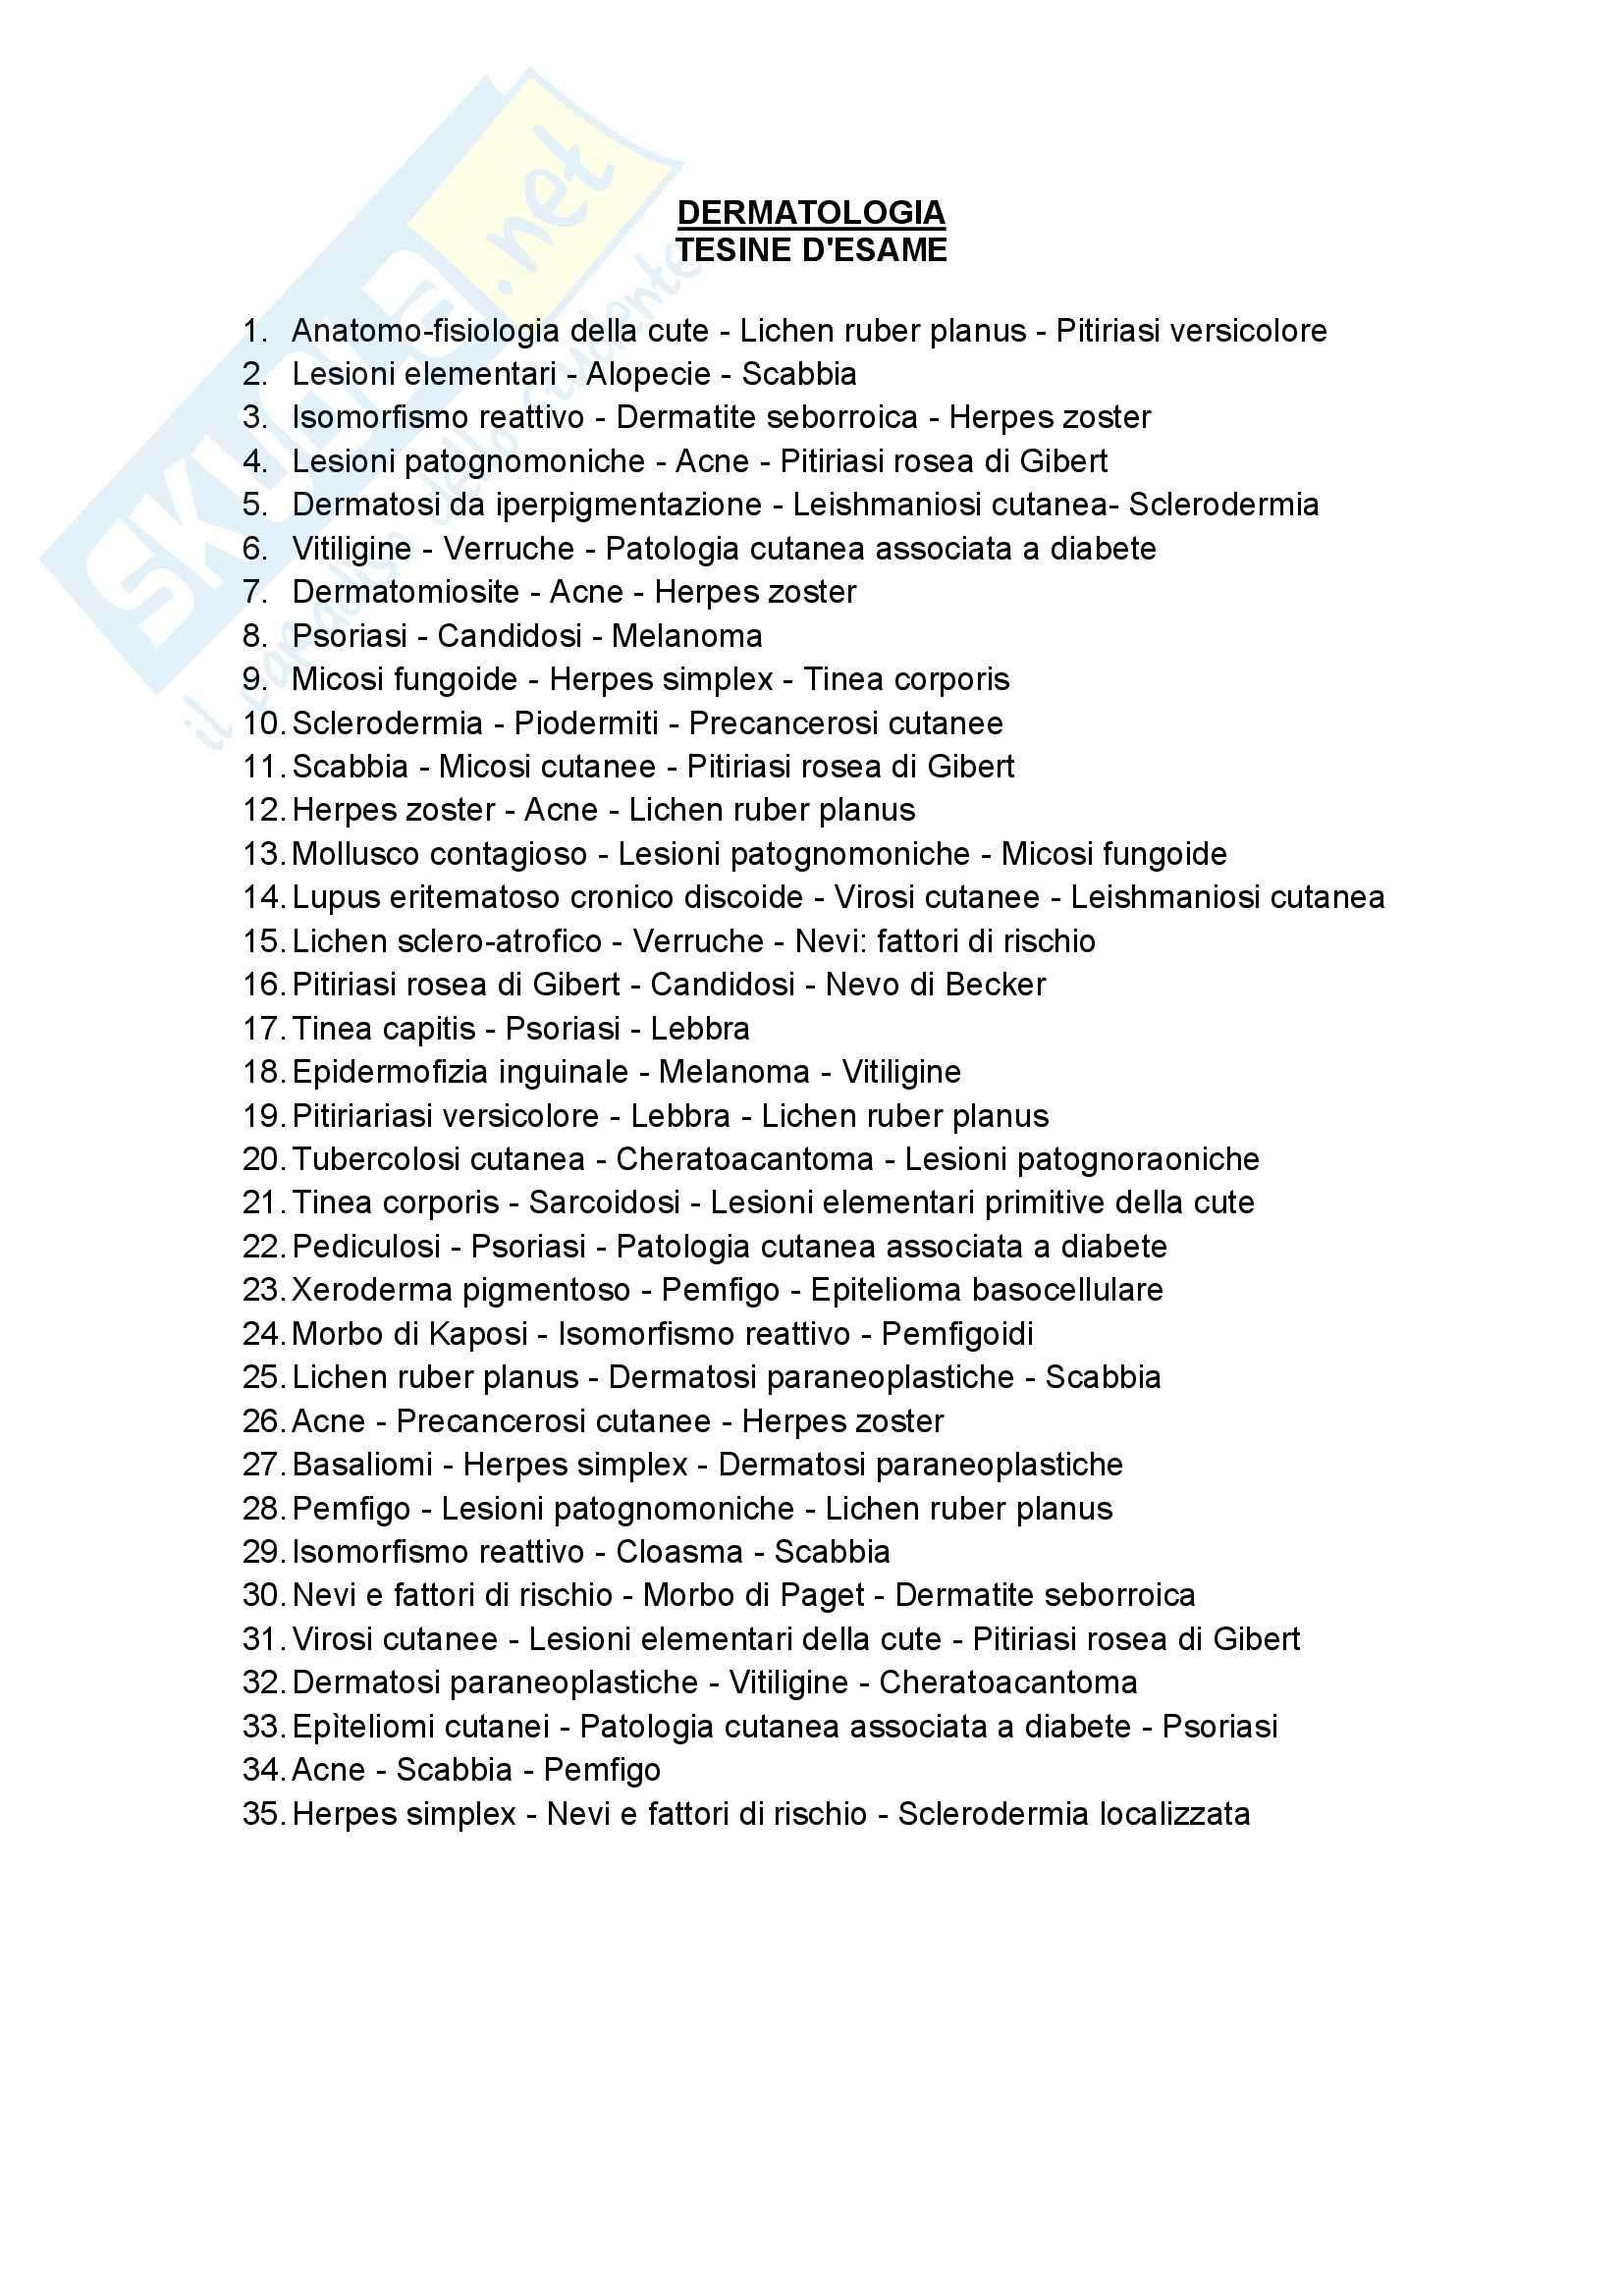 Dermatologia - l'elenco delle tesine d'esame